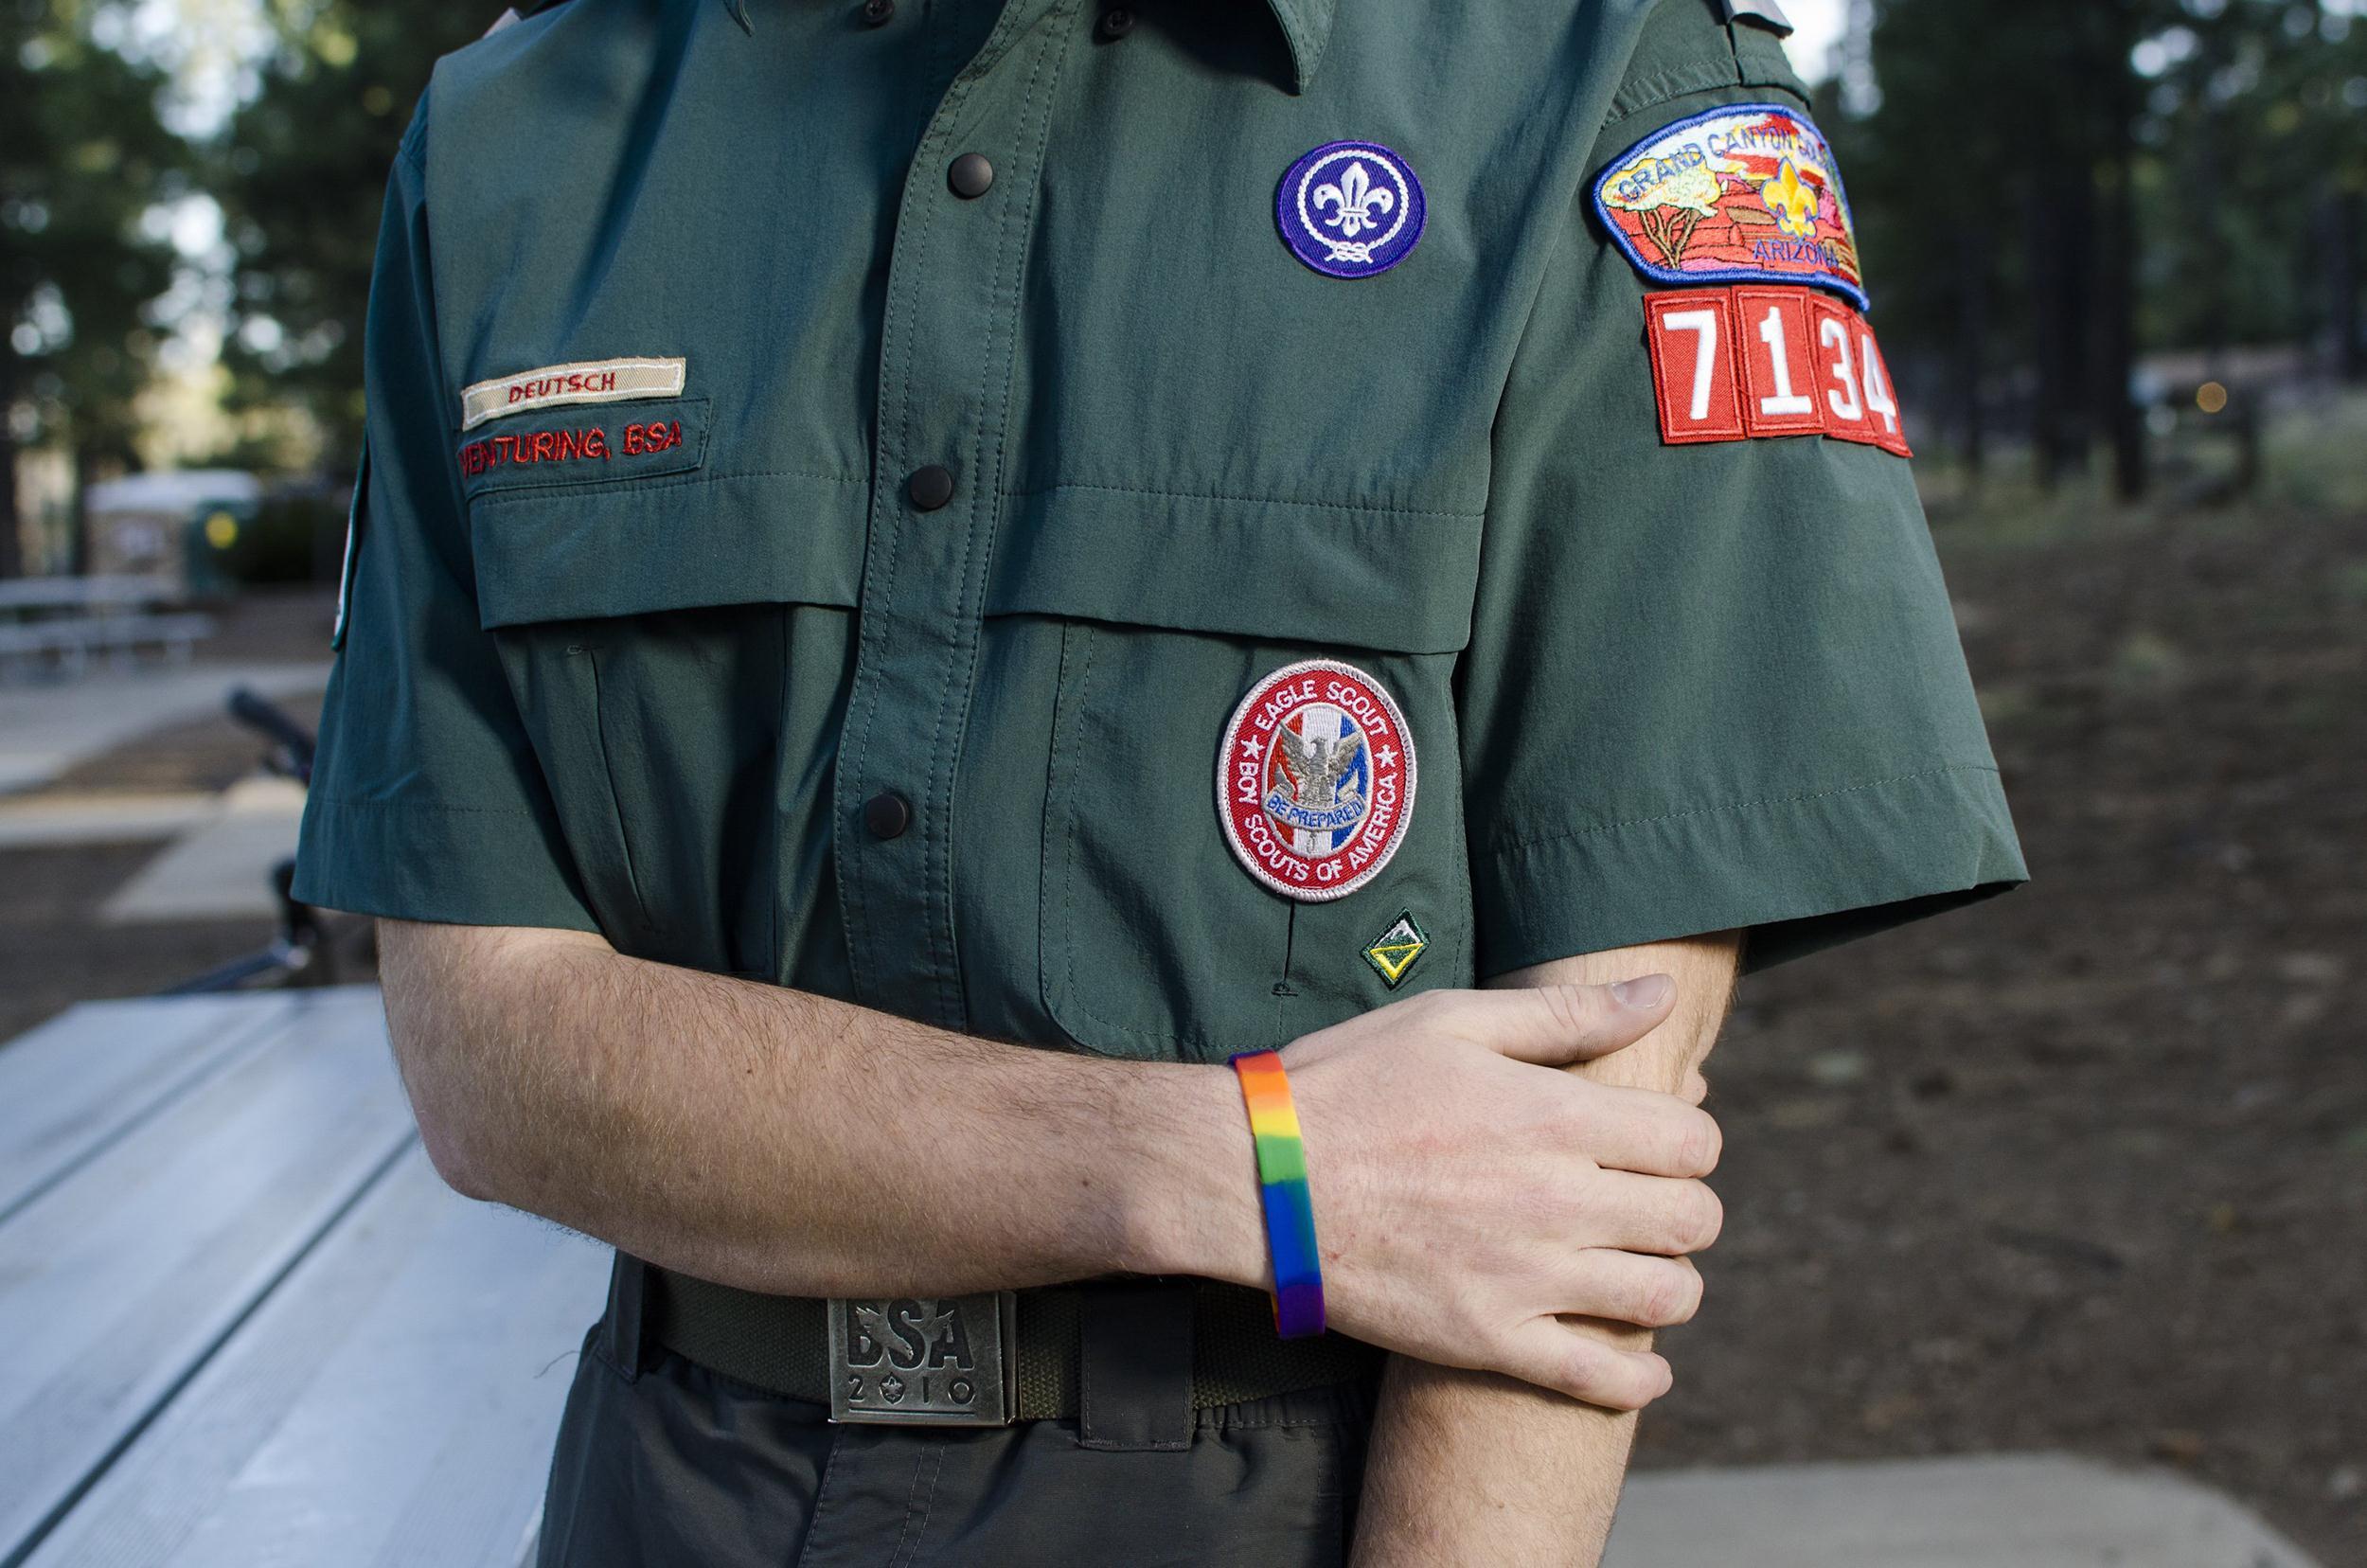 Image: Garrett Bryant in his Boy Scout uniform